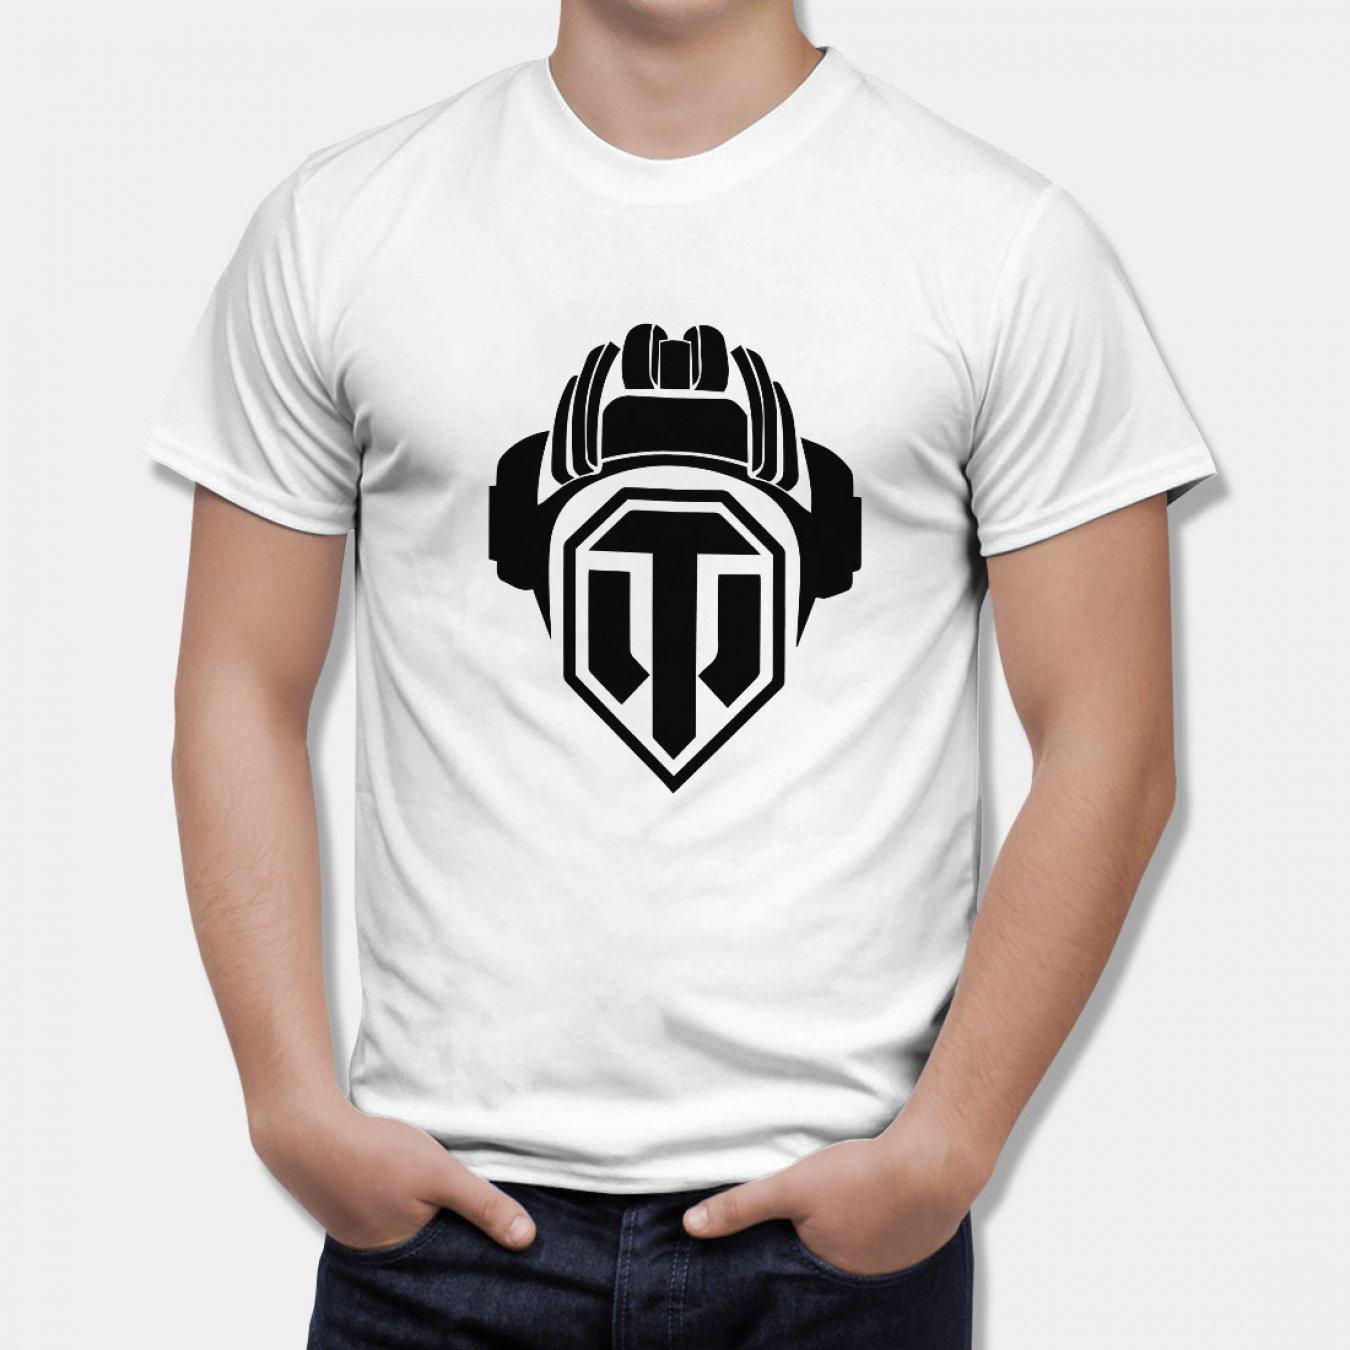 cbe15375337 Тениска World of Tanks - БЯЛА с черно Лого Helmet на World of Tanks в  Тематични